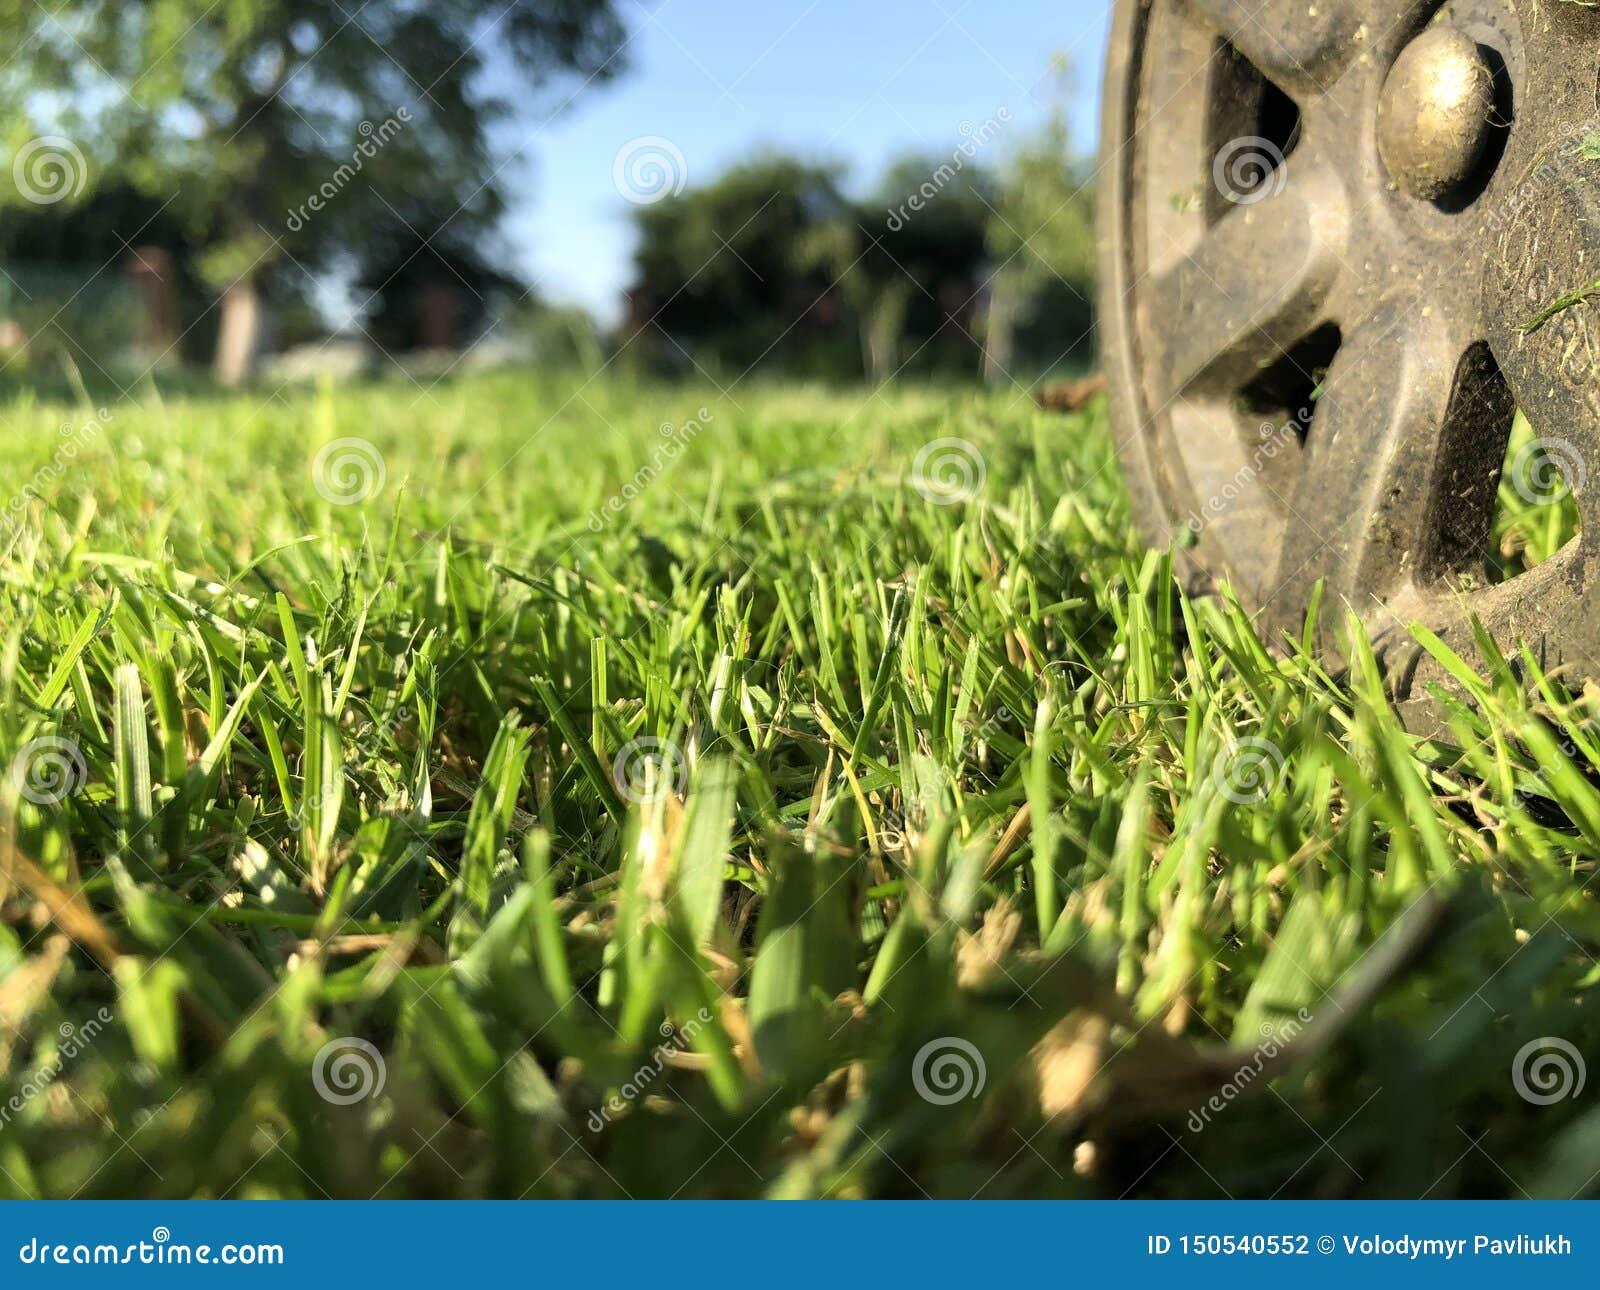 A wheel from a lawn mower on a truncheted farm lawn